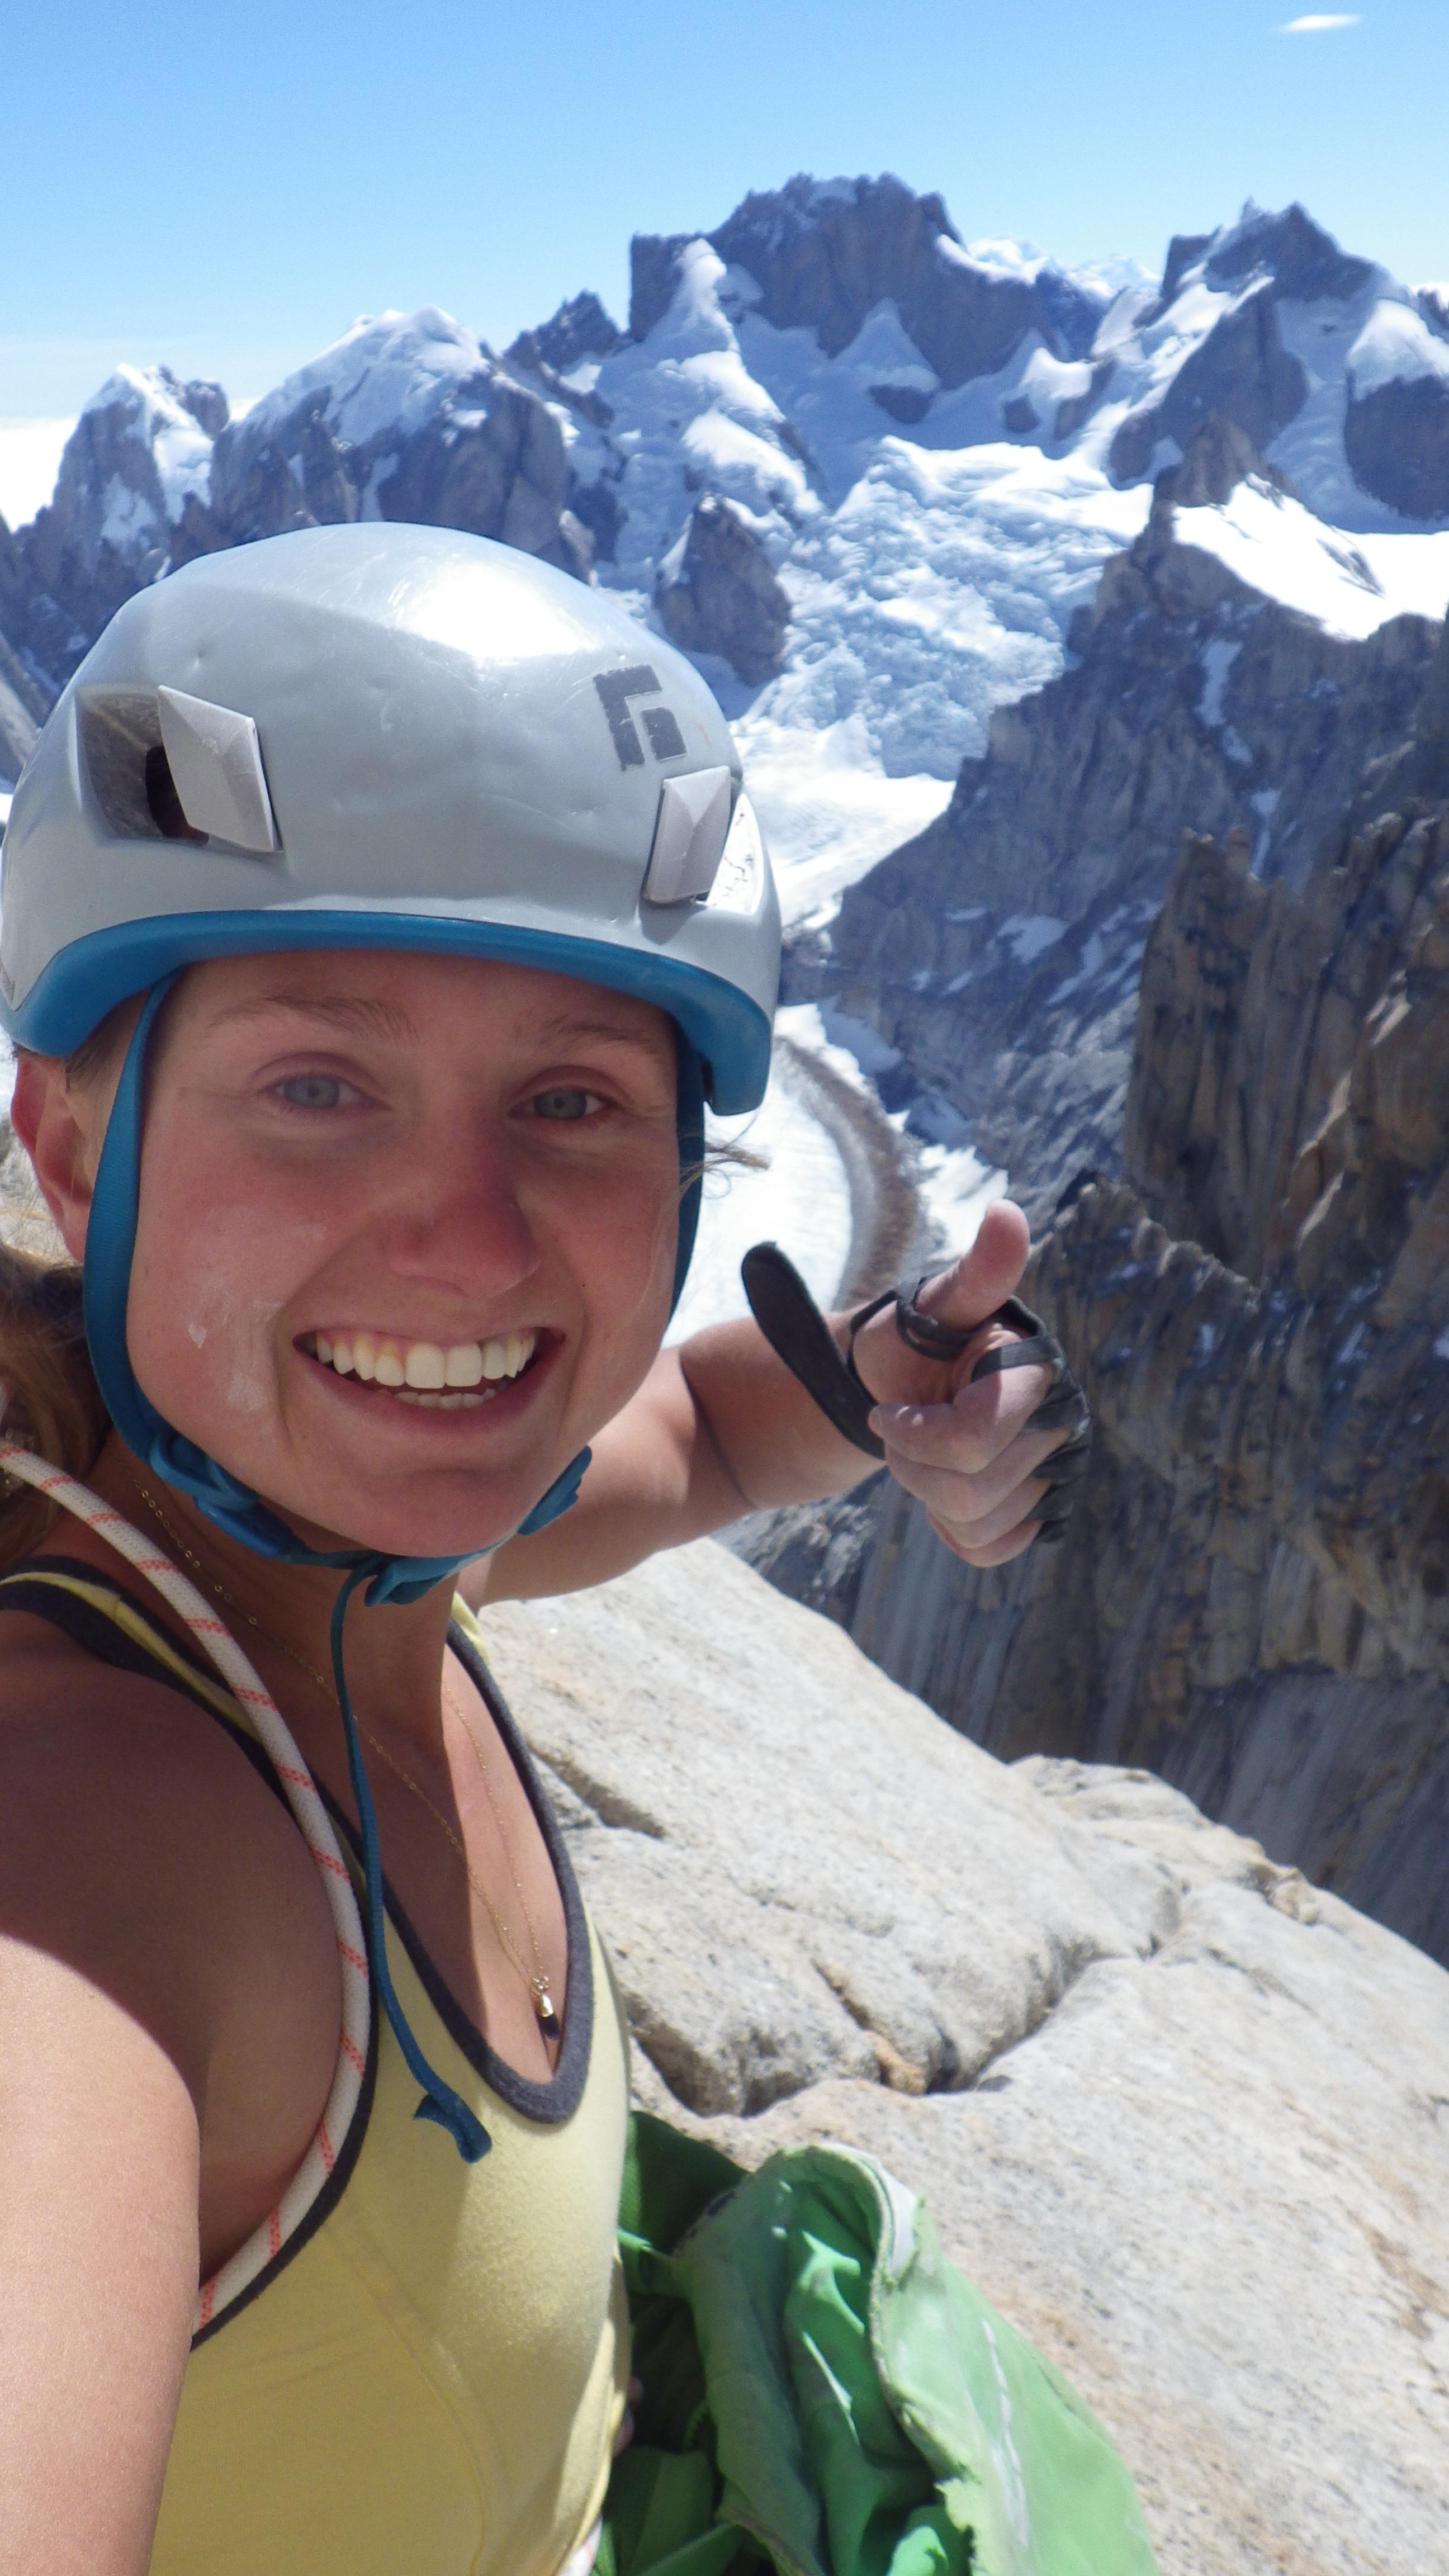 Brette Harrington takes a selfie near the top of Aguja Saint-Exupery on Chiaro di Luna (5.11a). Photo courtesy of Harrington.